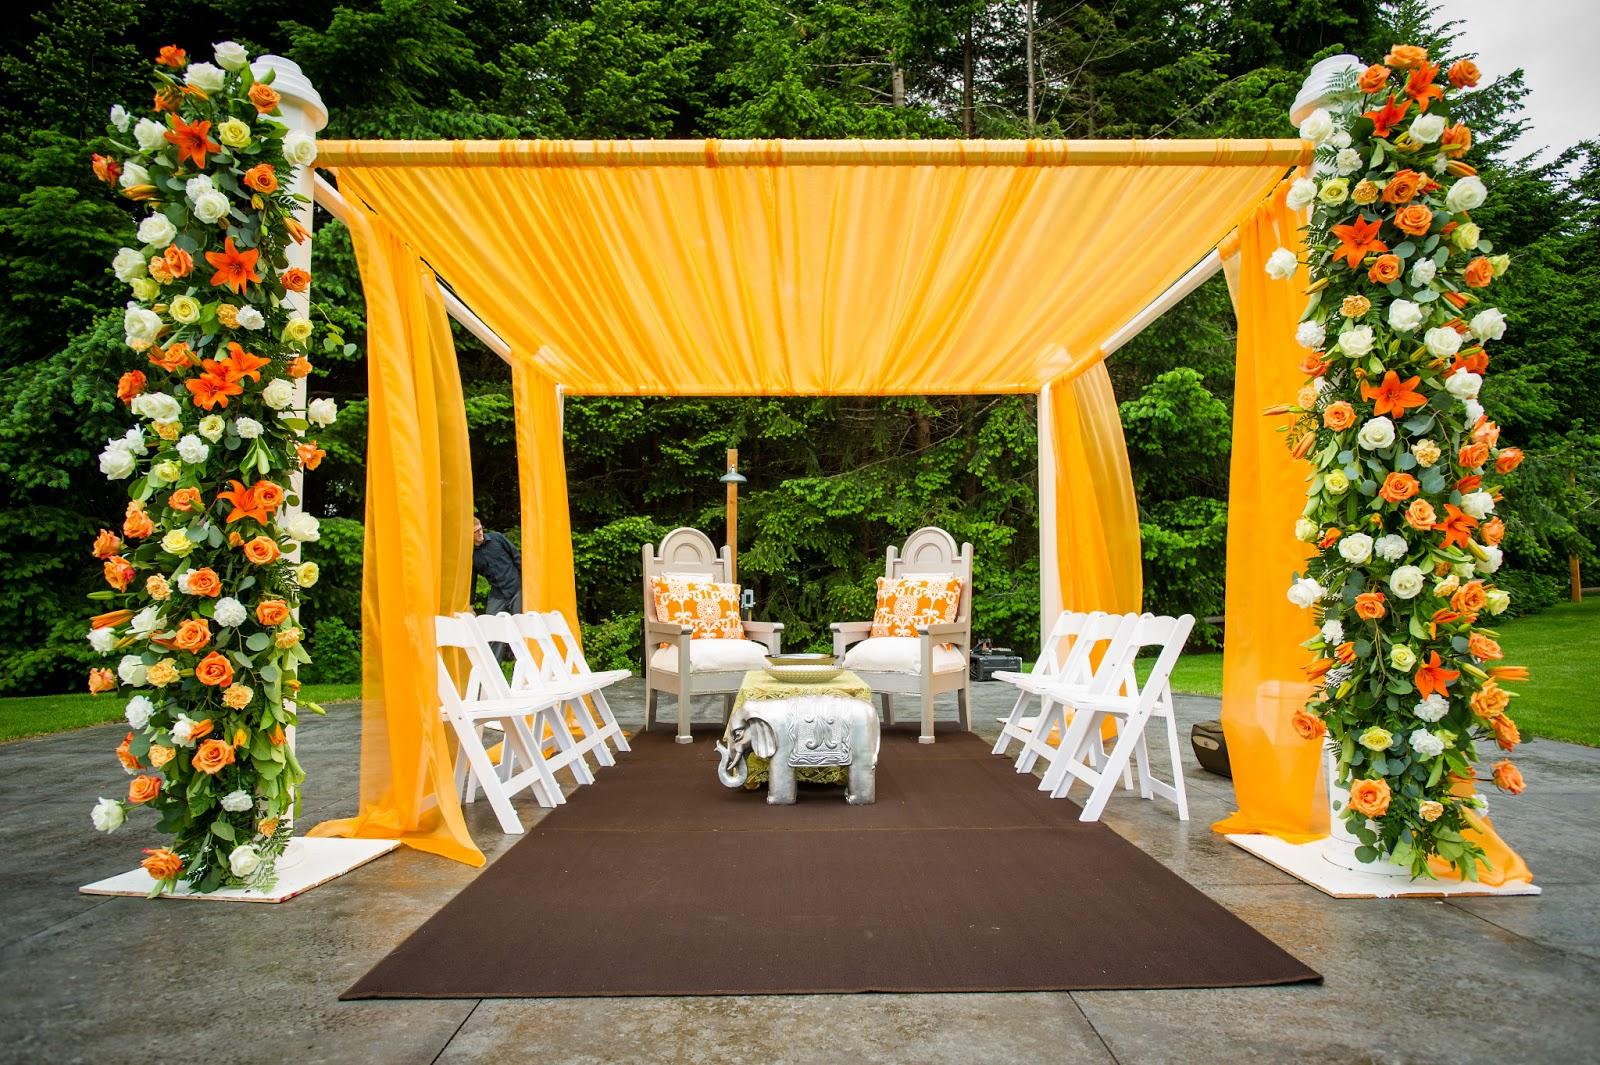 10 best outdoor wedding decoration ideas in 2018 web photo gallery 10 best outdoor wedding decoration ideas in 2018 junglespirit Choice Image